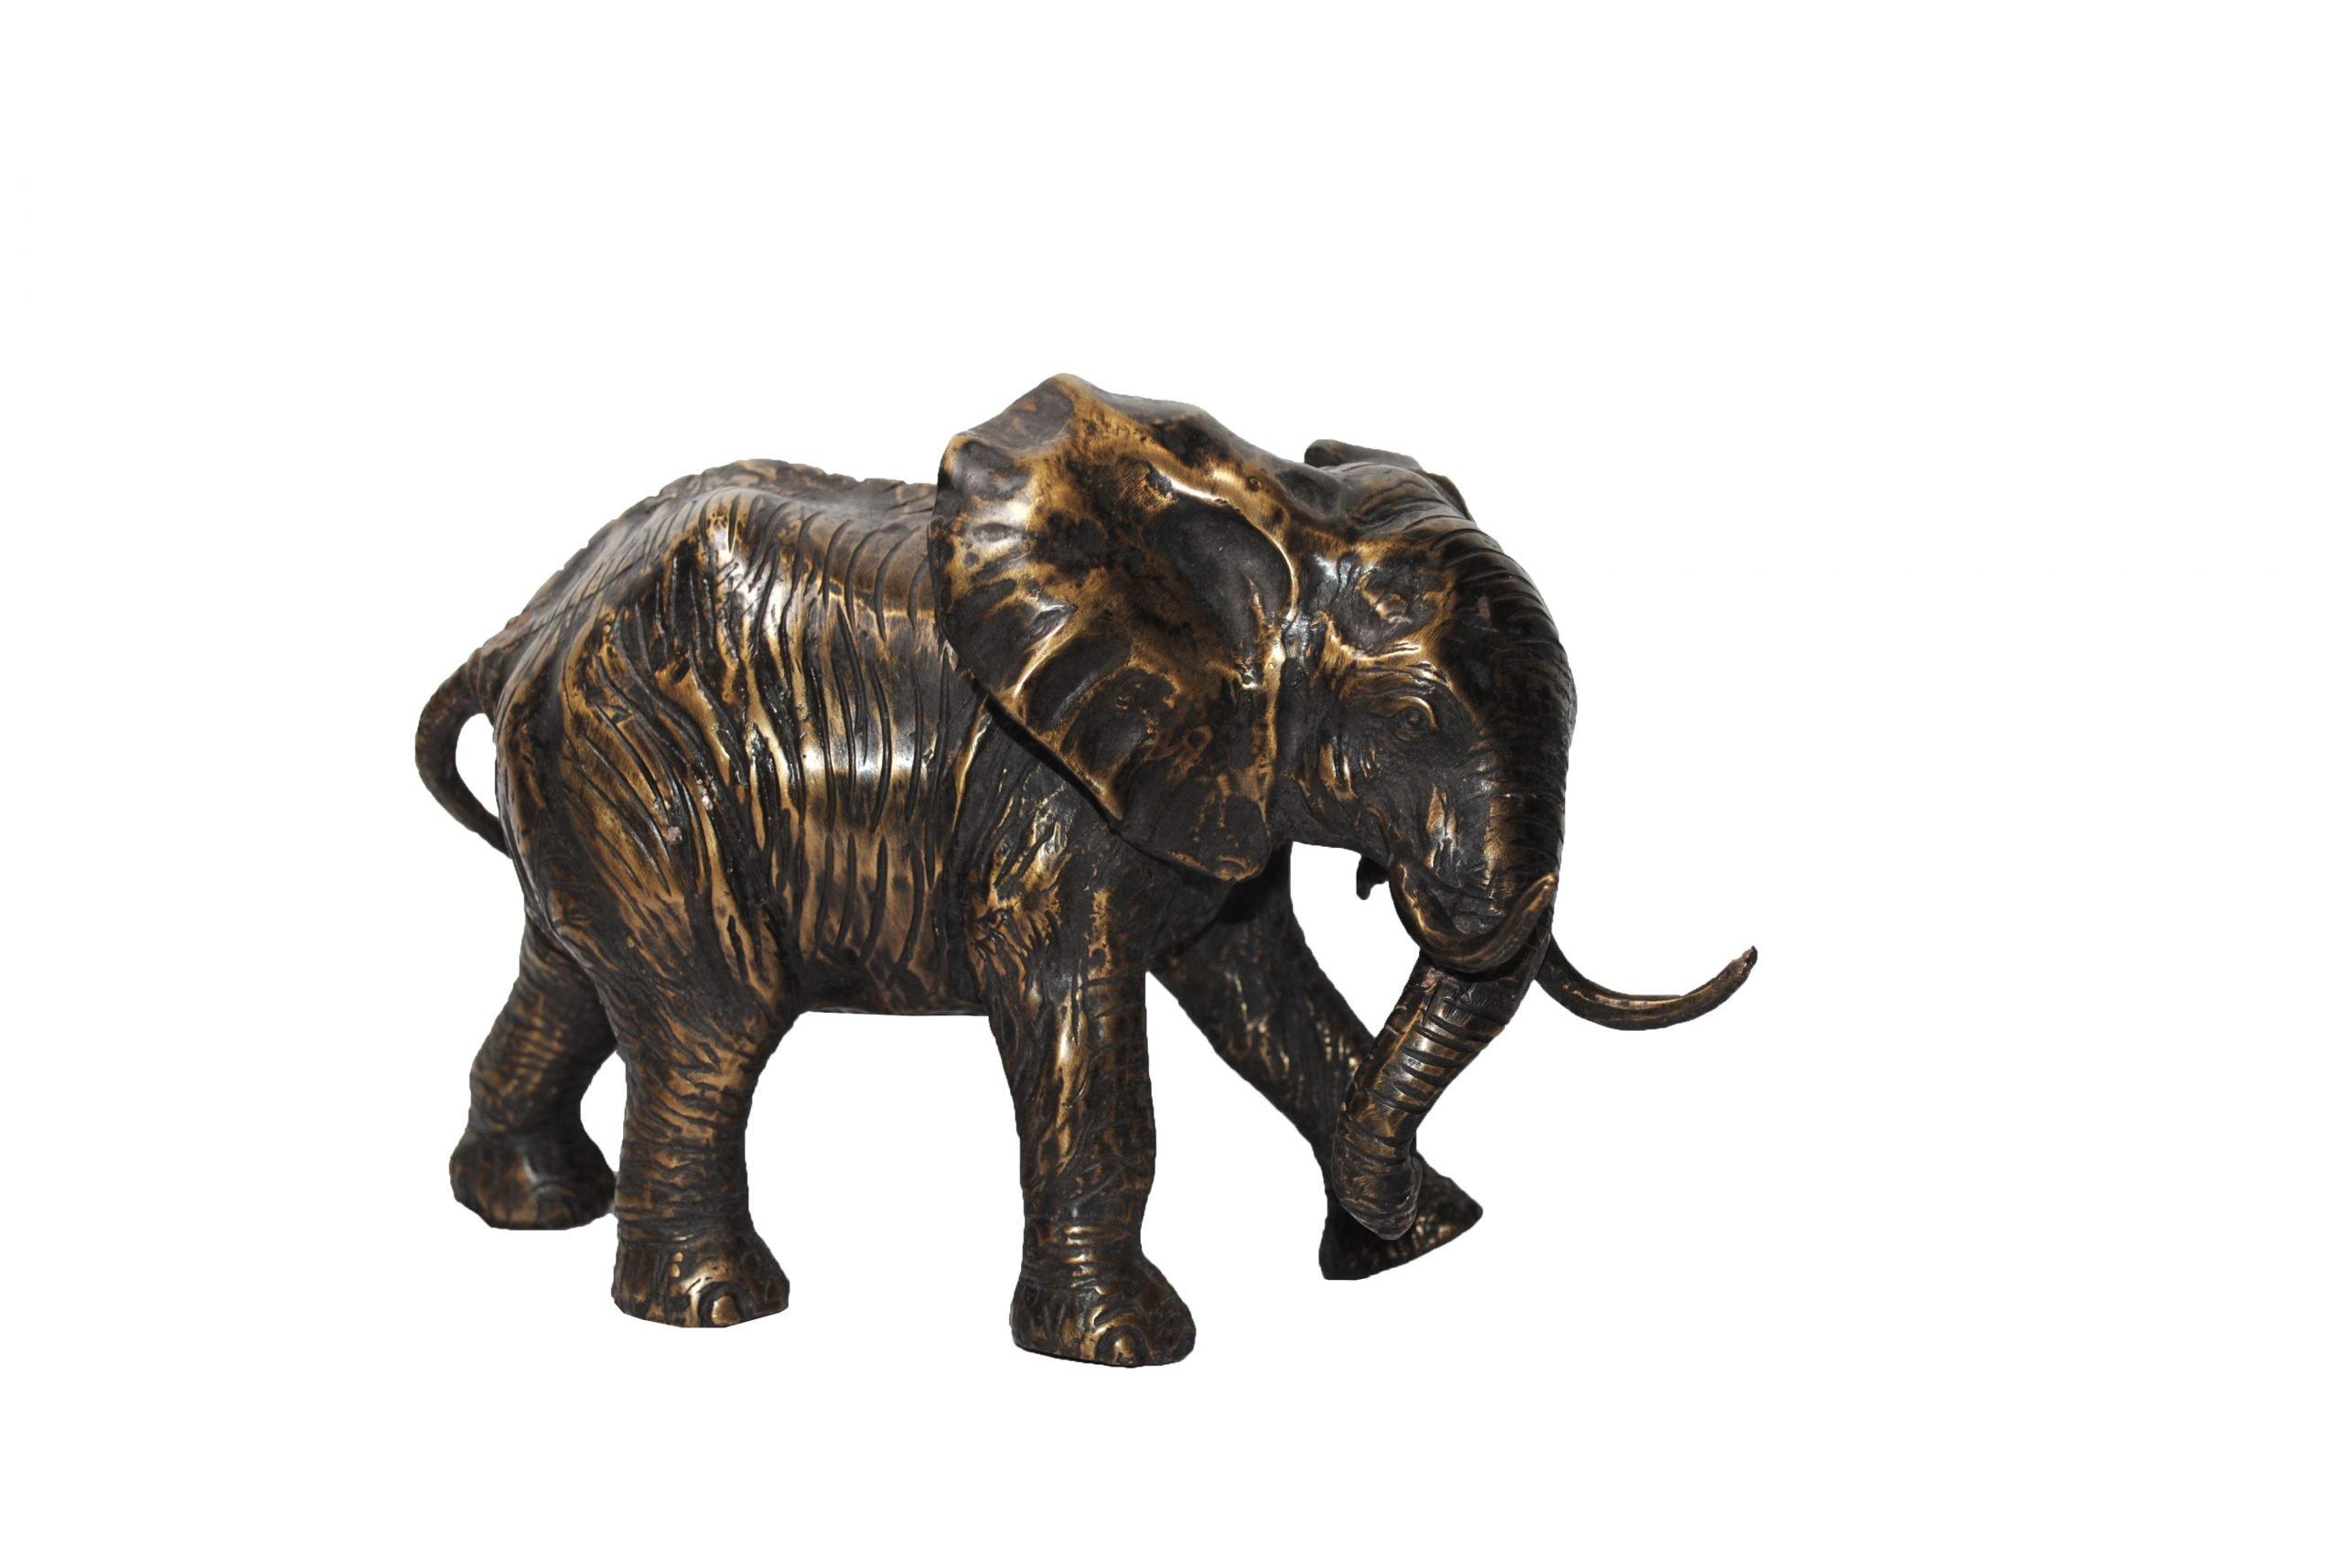 Bronzen Olifant Middel Slurf Omlaag